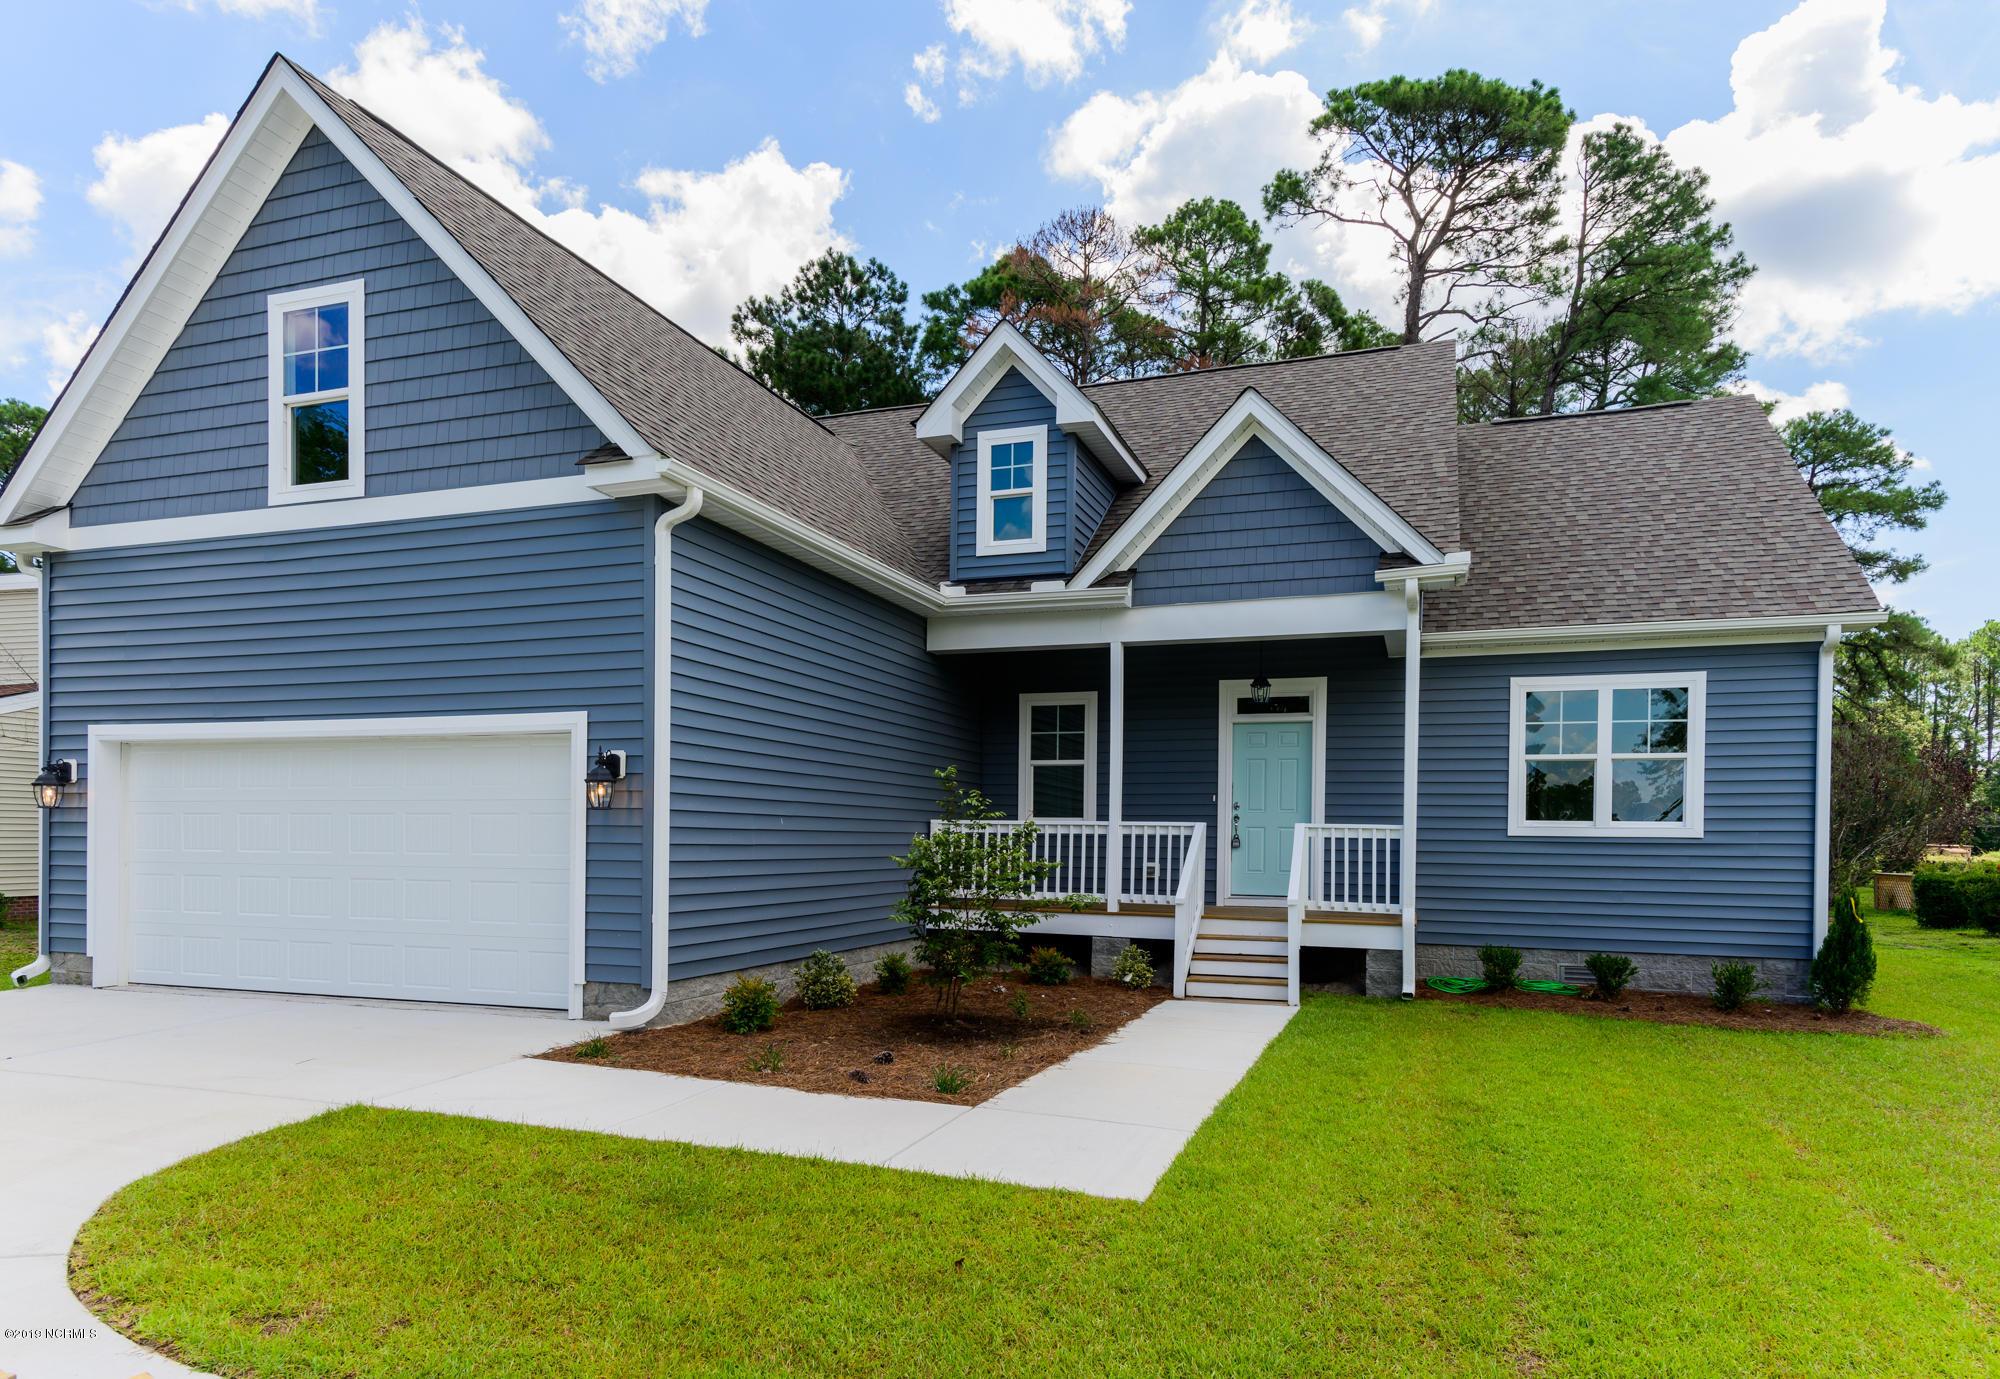 1206 Caracara Drive, New Bern, North Carolina 28560, 3 Bedrooms Bedrooms, 7 Rooms Rooms,2 BathroomsBathrooms,Single family residence,For sale,Caracara,100180220